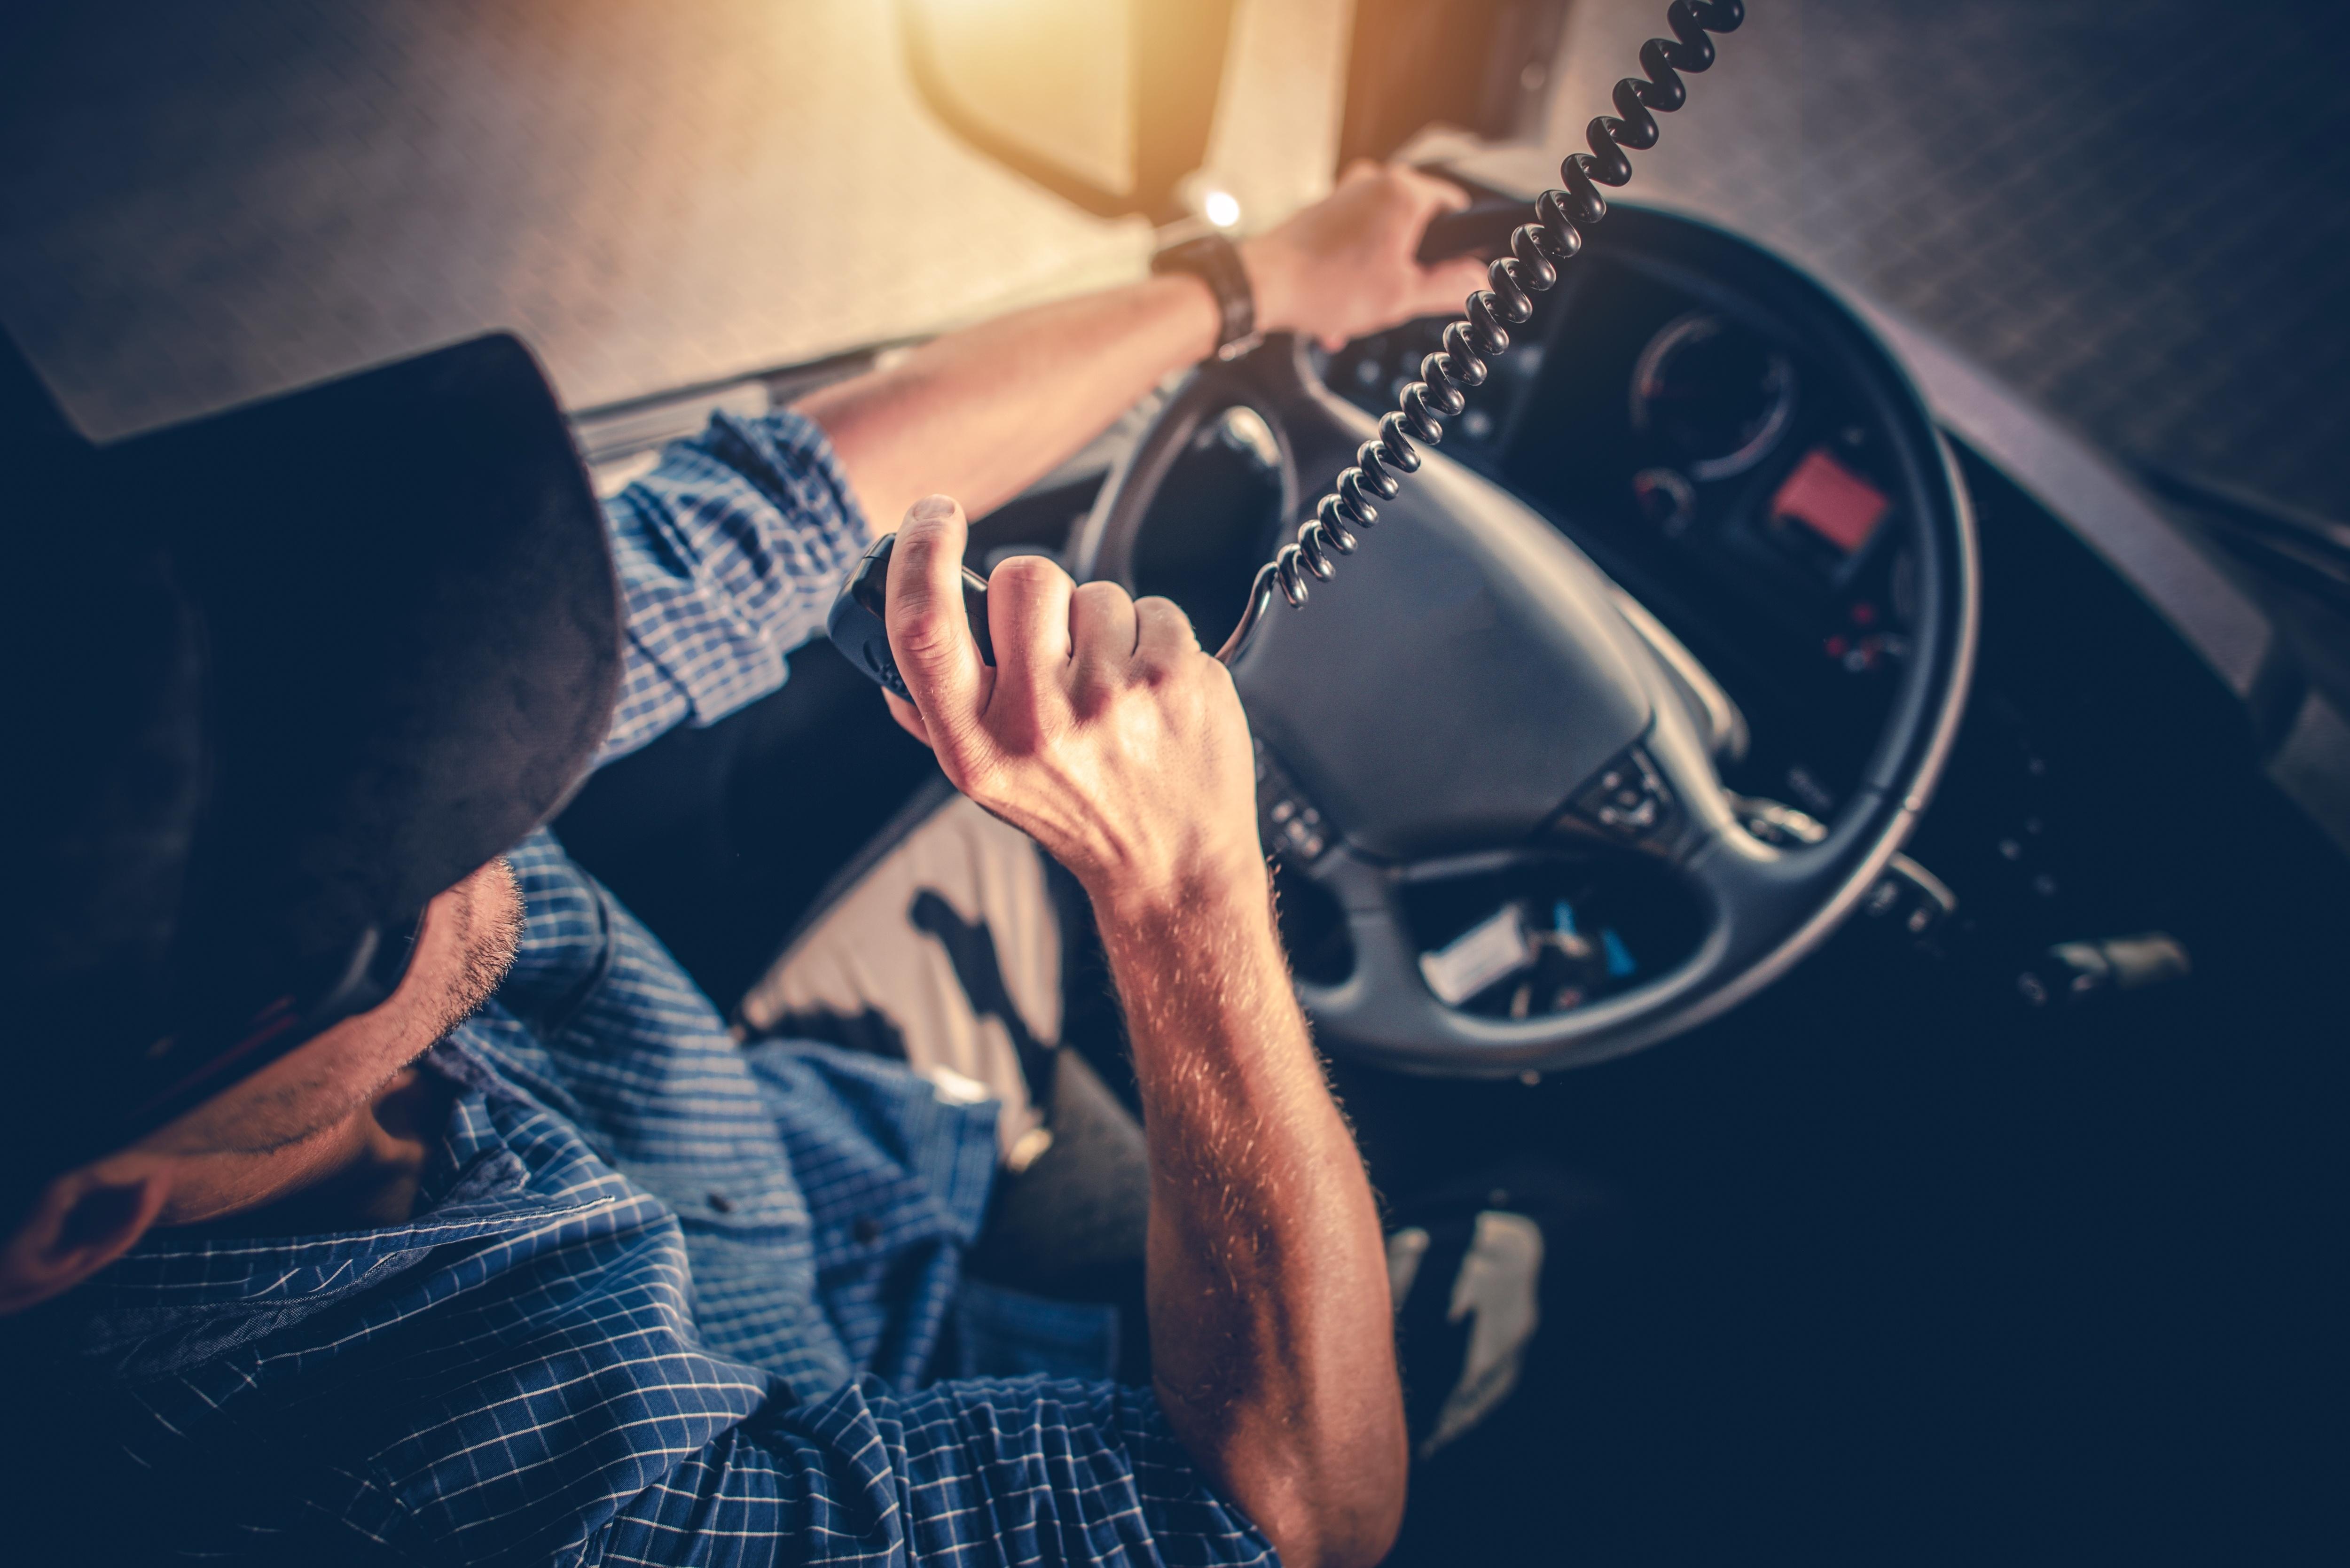 Truck Driver Using CBD Radio